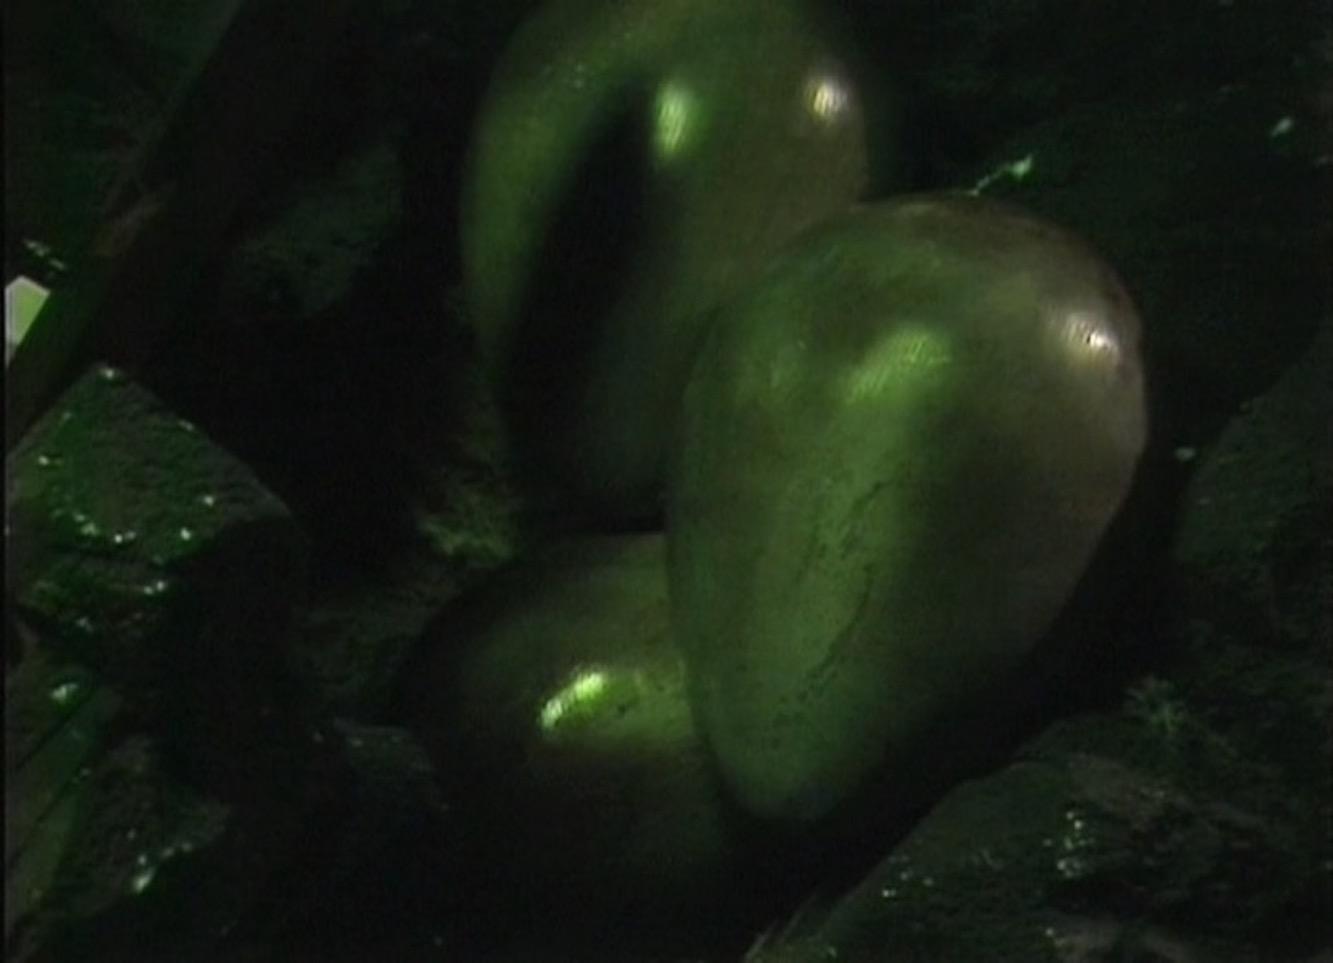 Giant Maggots